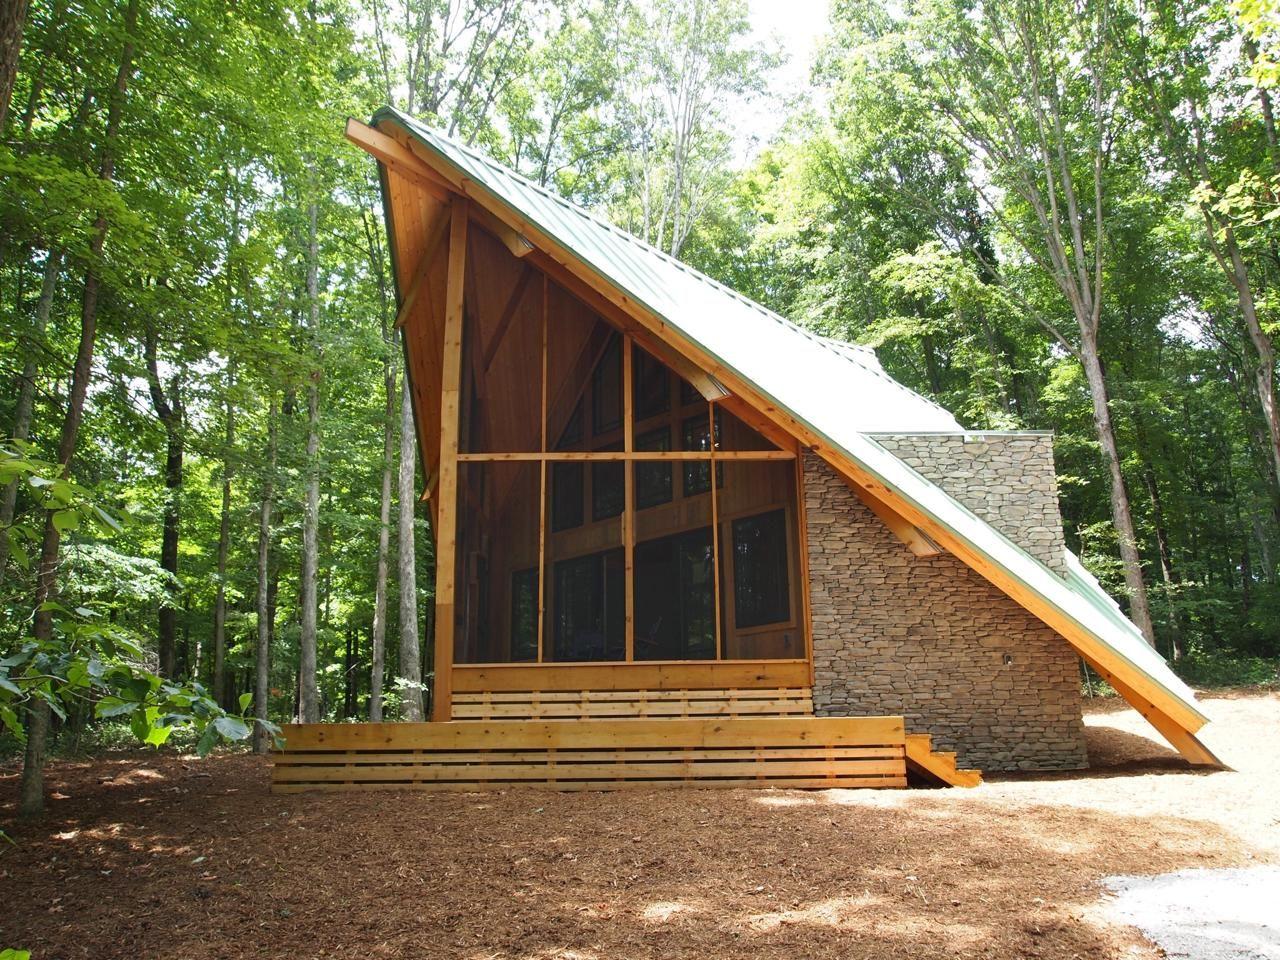 cabi mtn rose vacation cabins homeaway log peaceful sevierville near mountain tn rental nashville